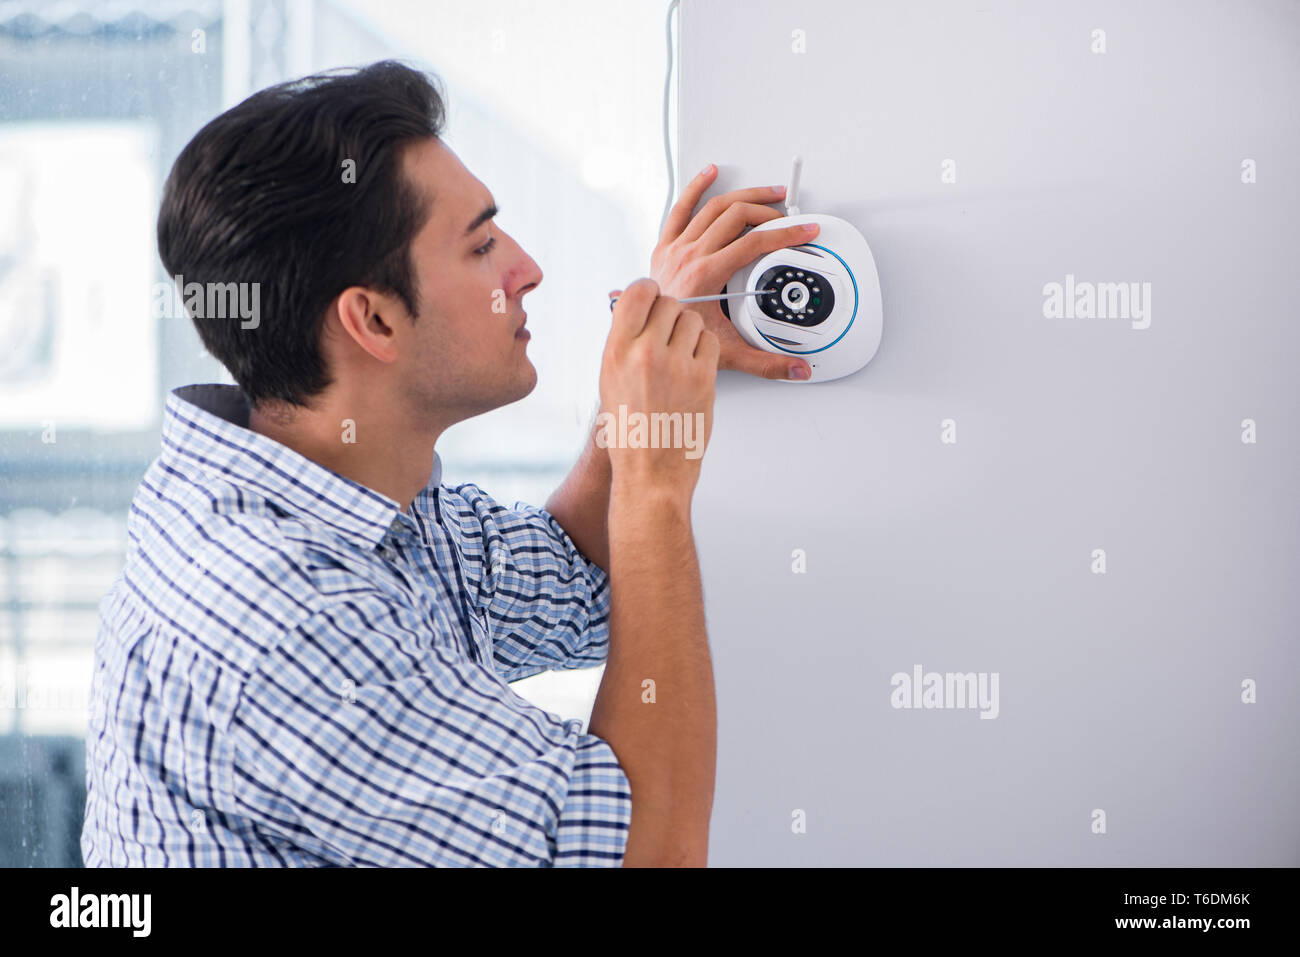 Residential Smoke Detector Wiring Code